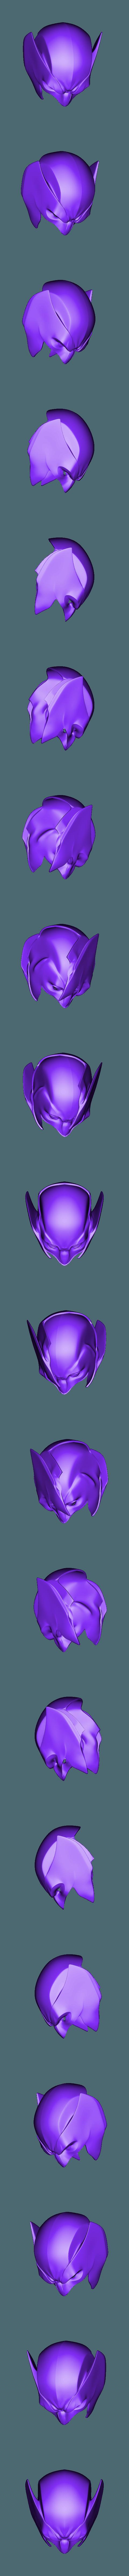 ShortEarBackCut.stl Download STL file Wolverine Mask • 3D printable model, VillainousPropShop